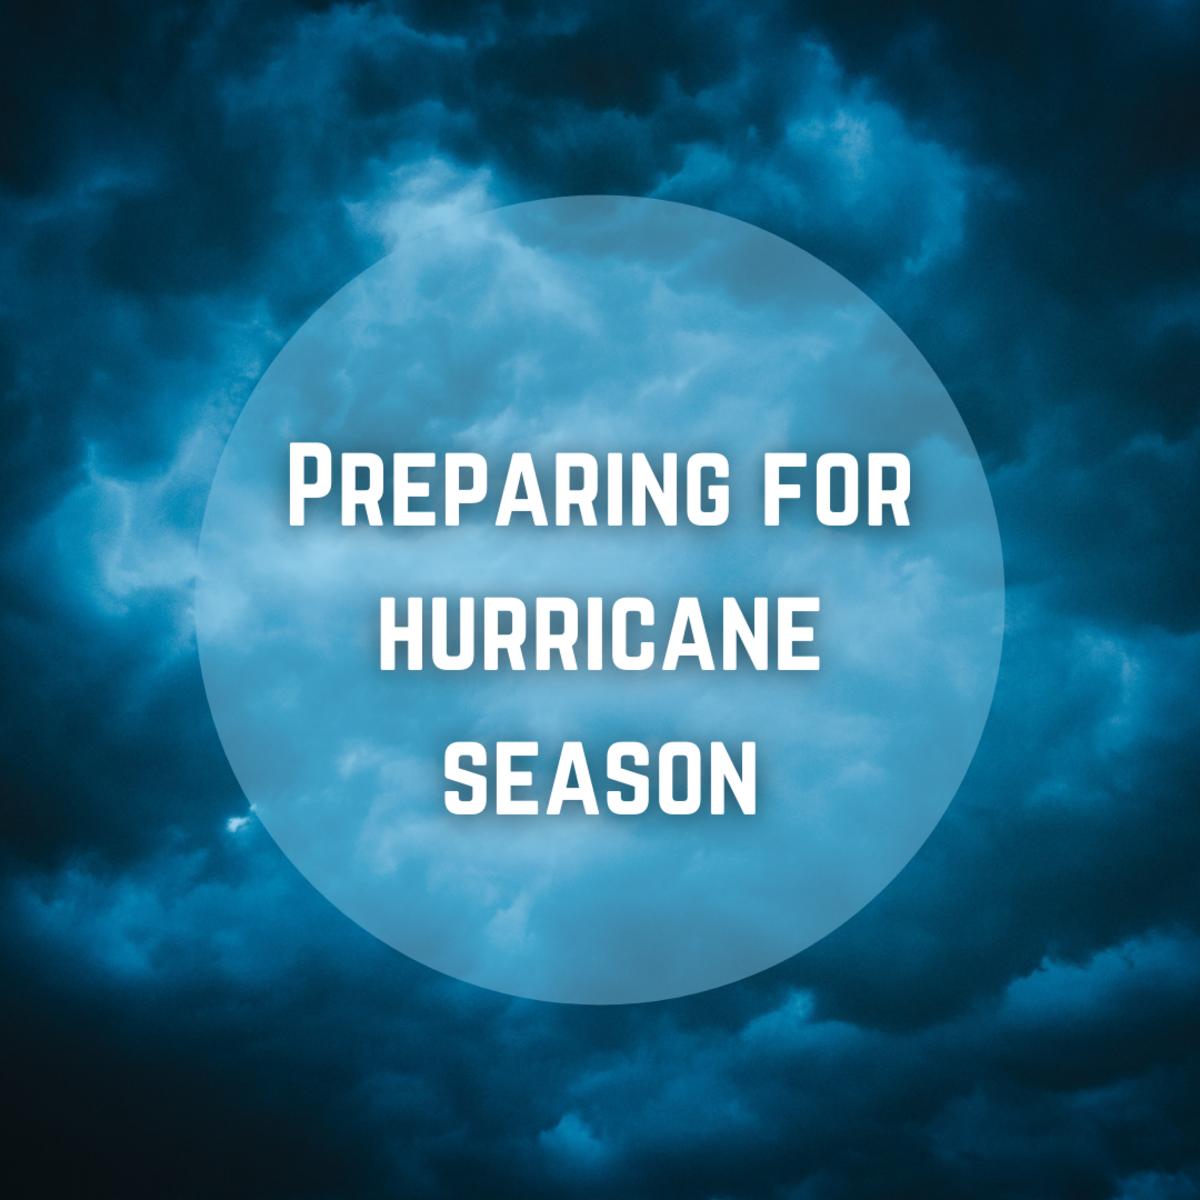 Learn vital steps to take when preparing for hurricane season